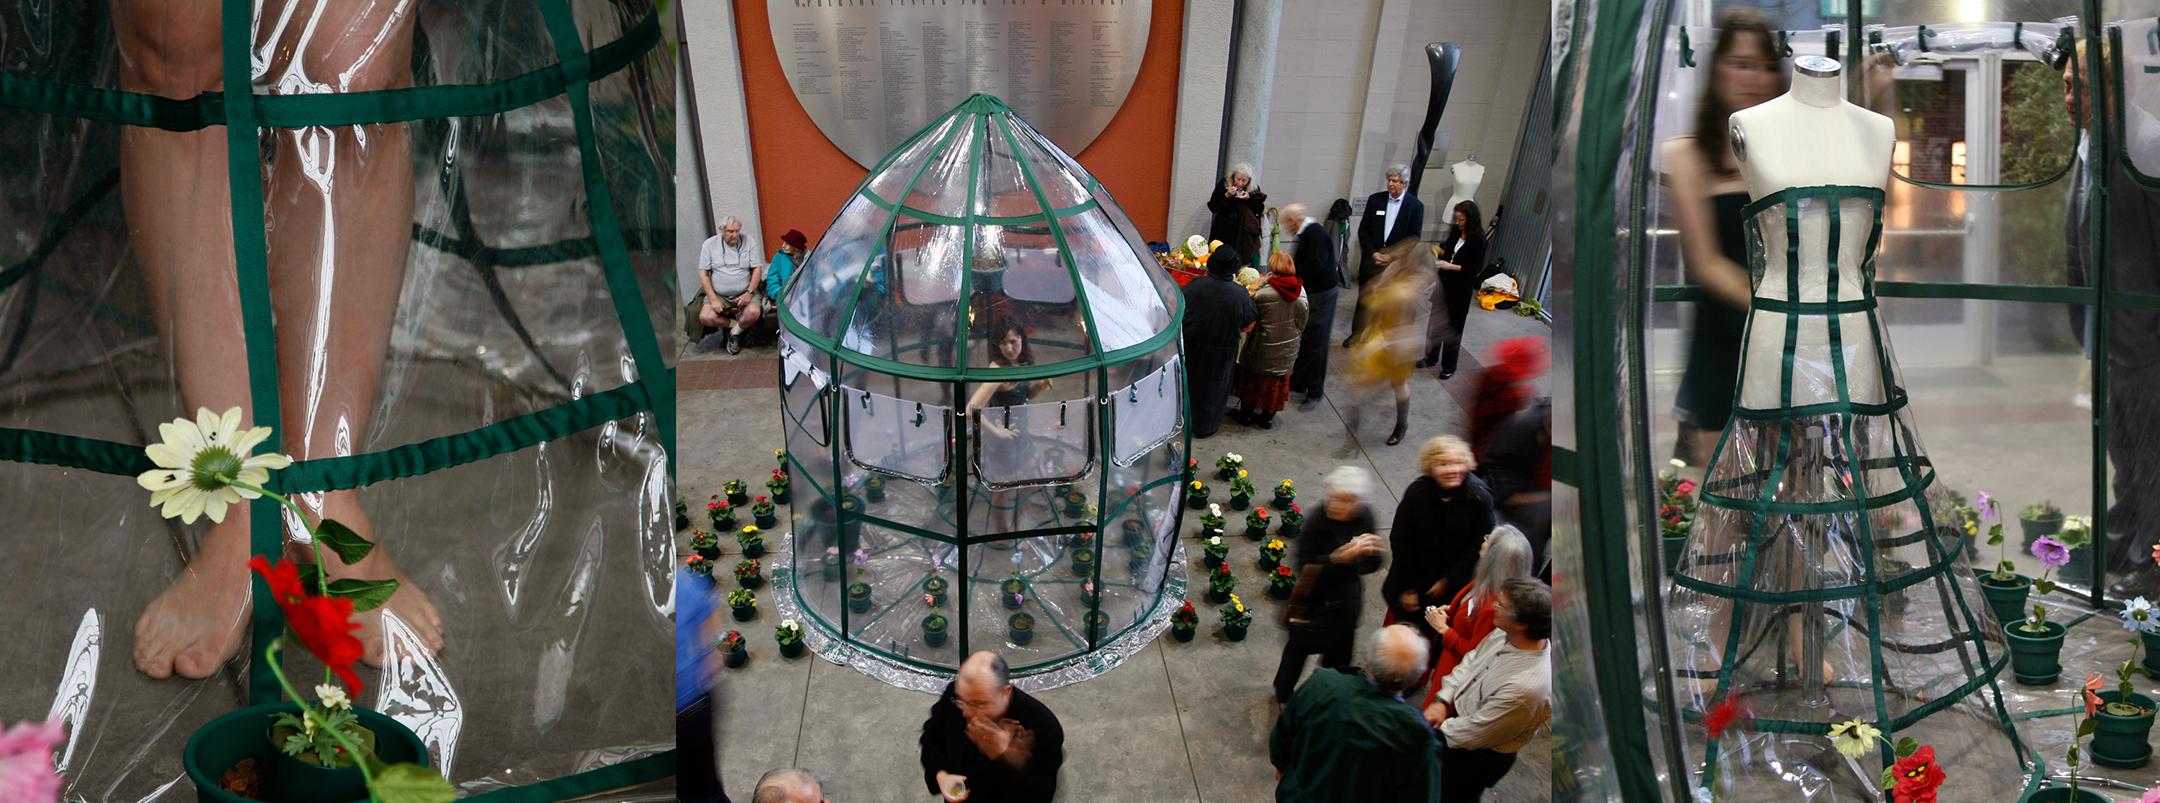 GREENHOUSE DRESS TENT INSTALLATION  Santa Cruz Museum of Art, Santa Cruz, CA